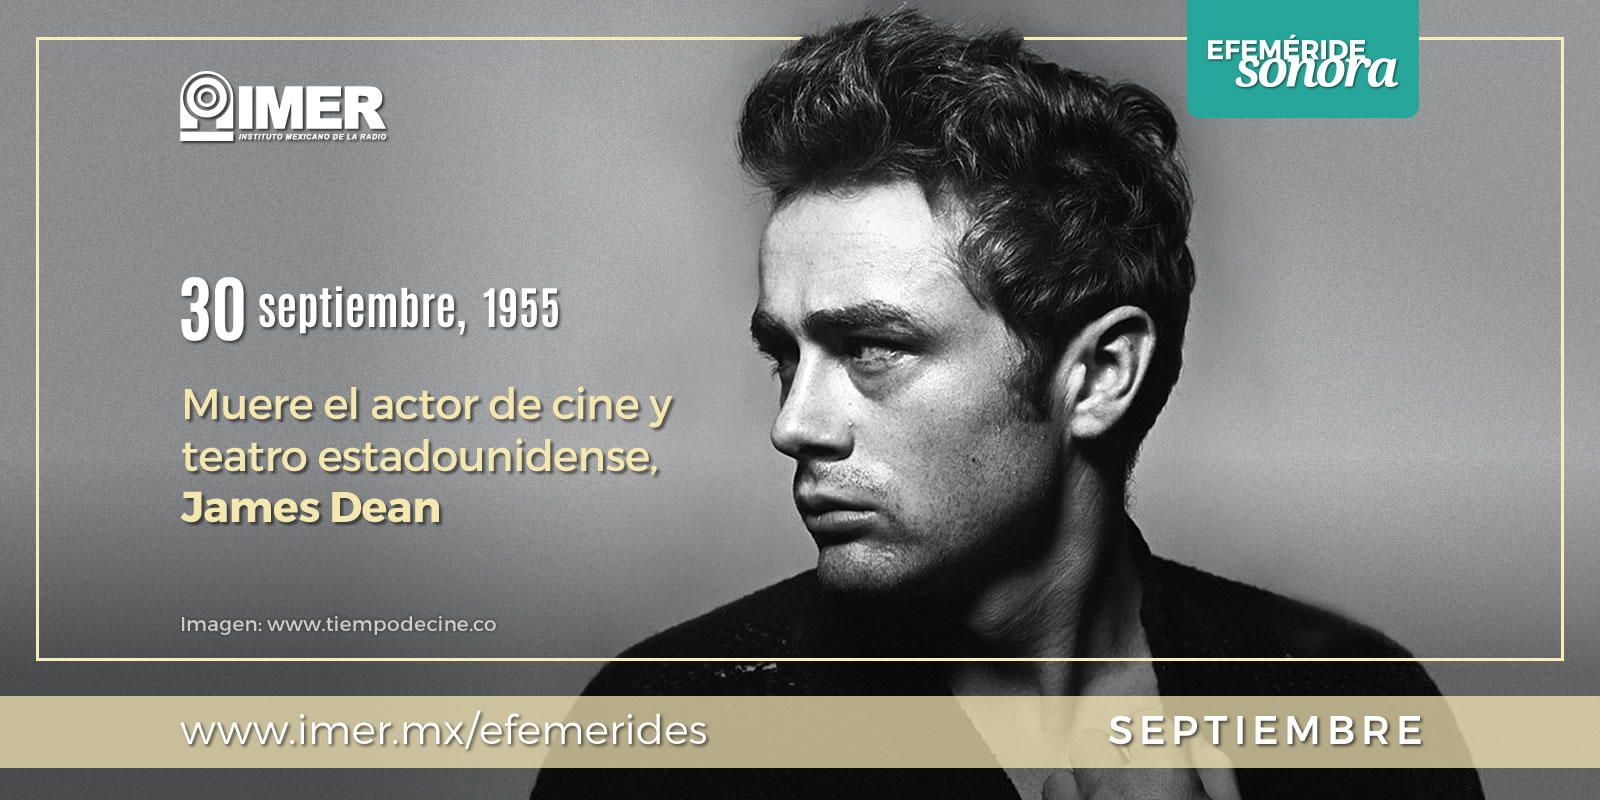 30 de septiembre de 1955 muere el actor James Dean – IMER